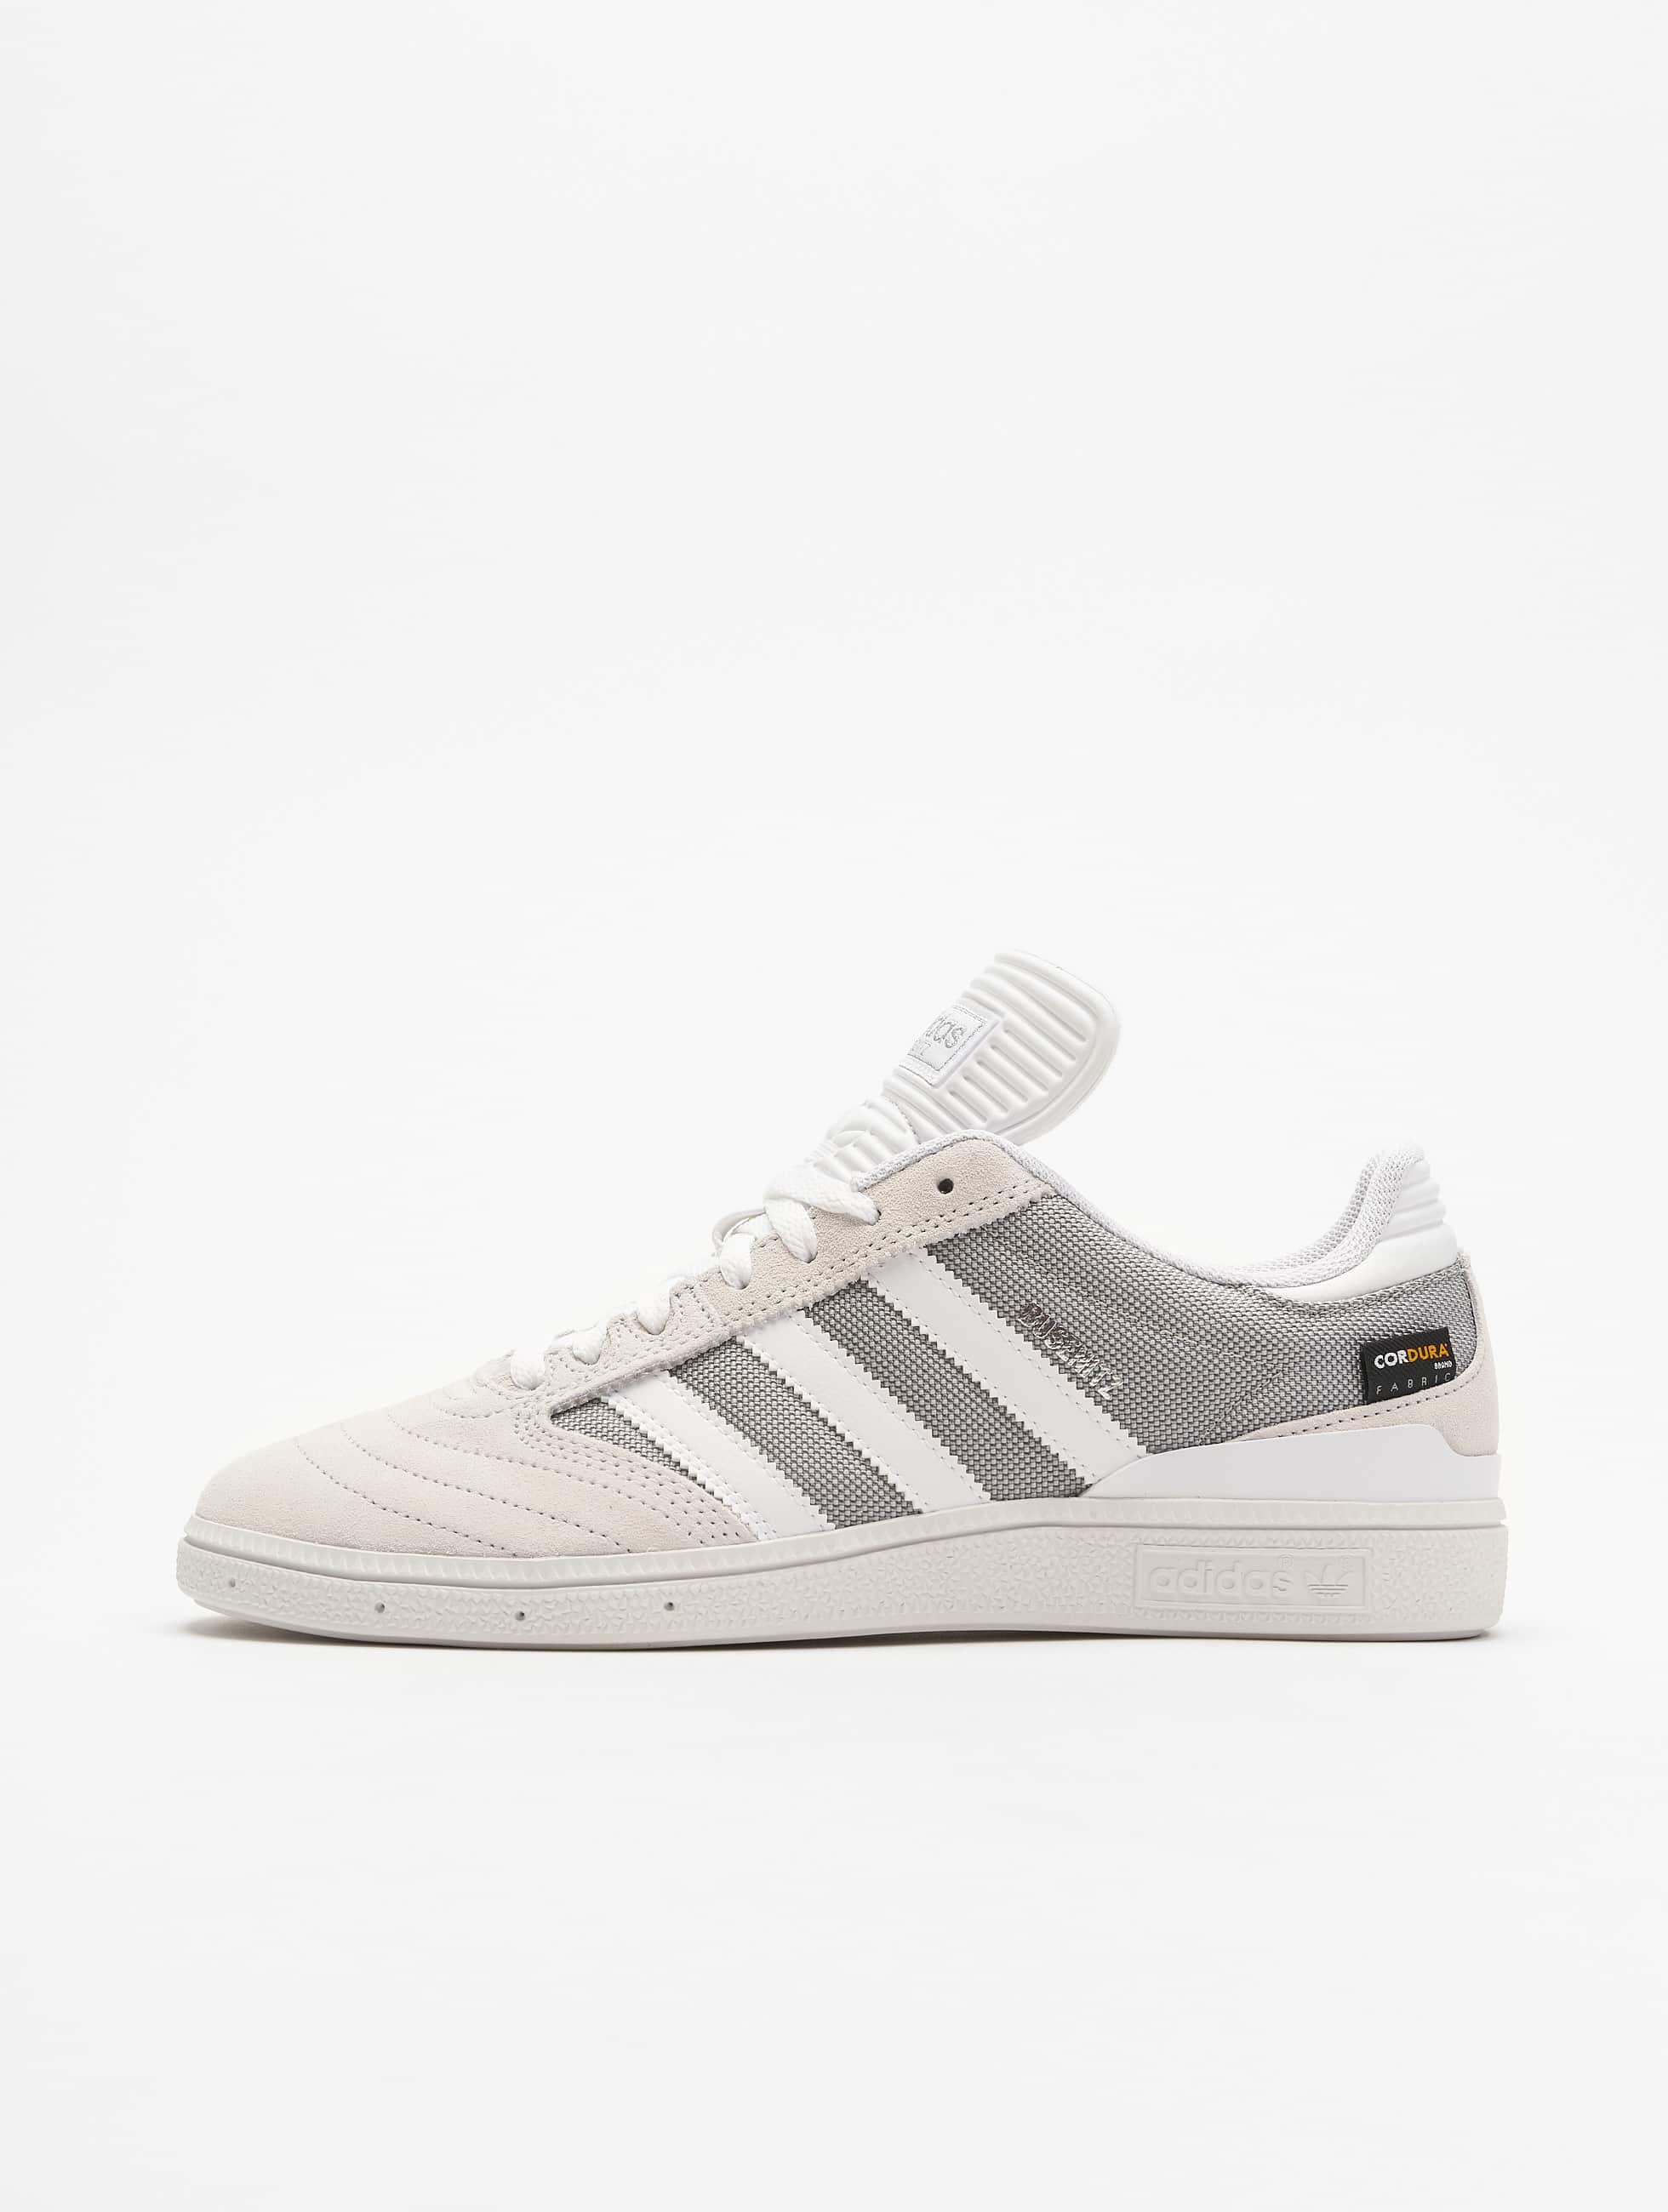 White Busenitz Whitefootwear Whitecry Originals Footwear Sneakers Adidas bv6gf7Yy